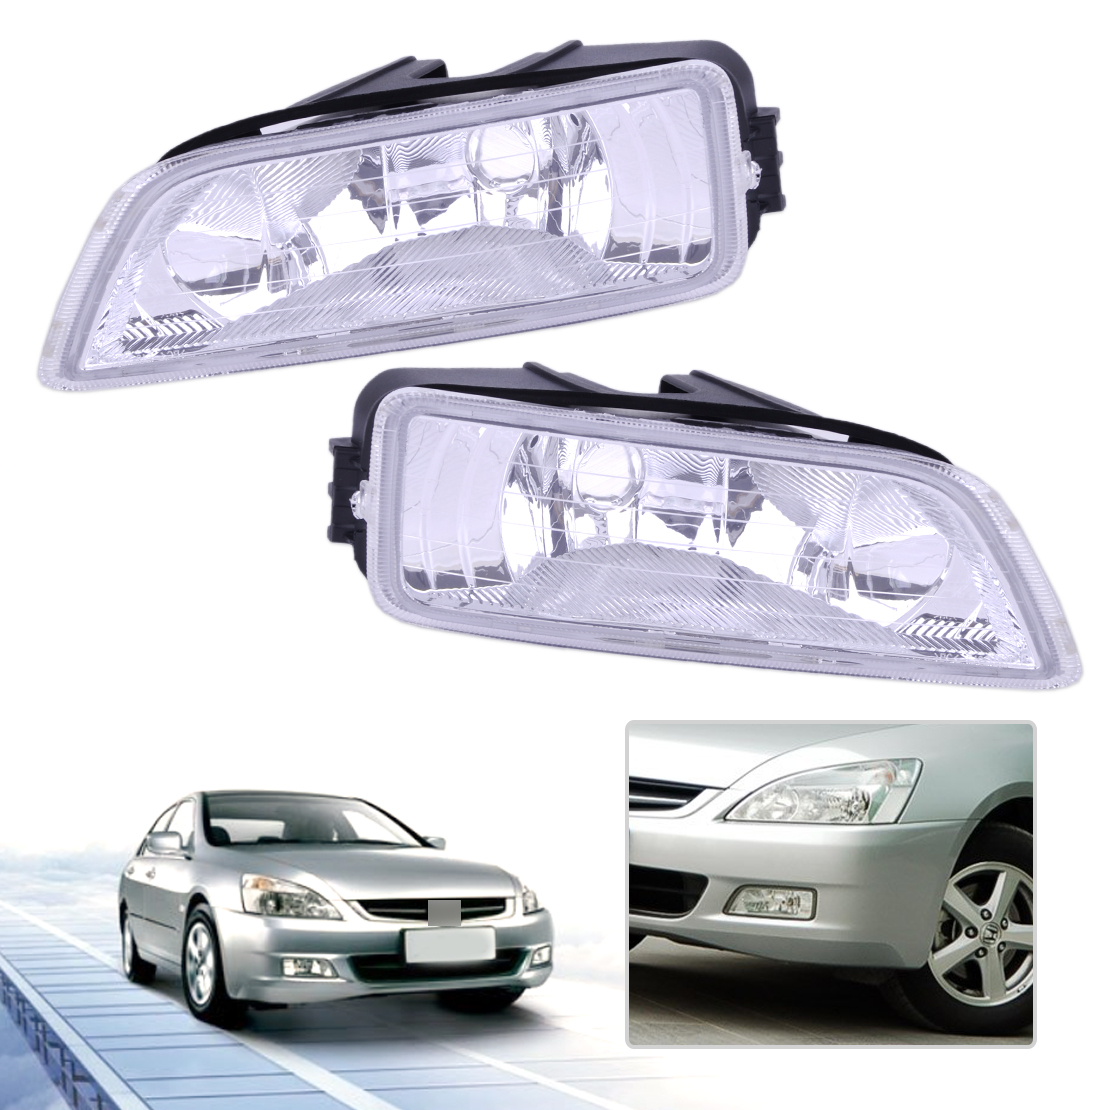 CITALL Front Right + Left Fog Light Lamp Cover Shell 33951-SDA-H01 33901-SDA-H01 Fit for Honda Accord 2003 2004 2005 2006 2007